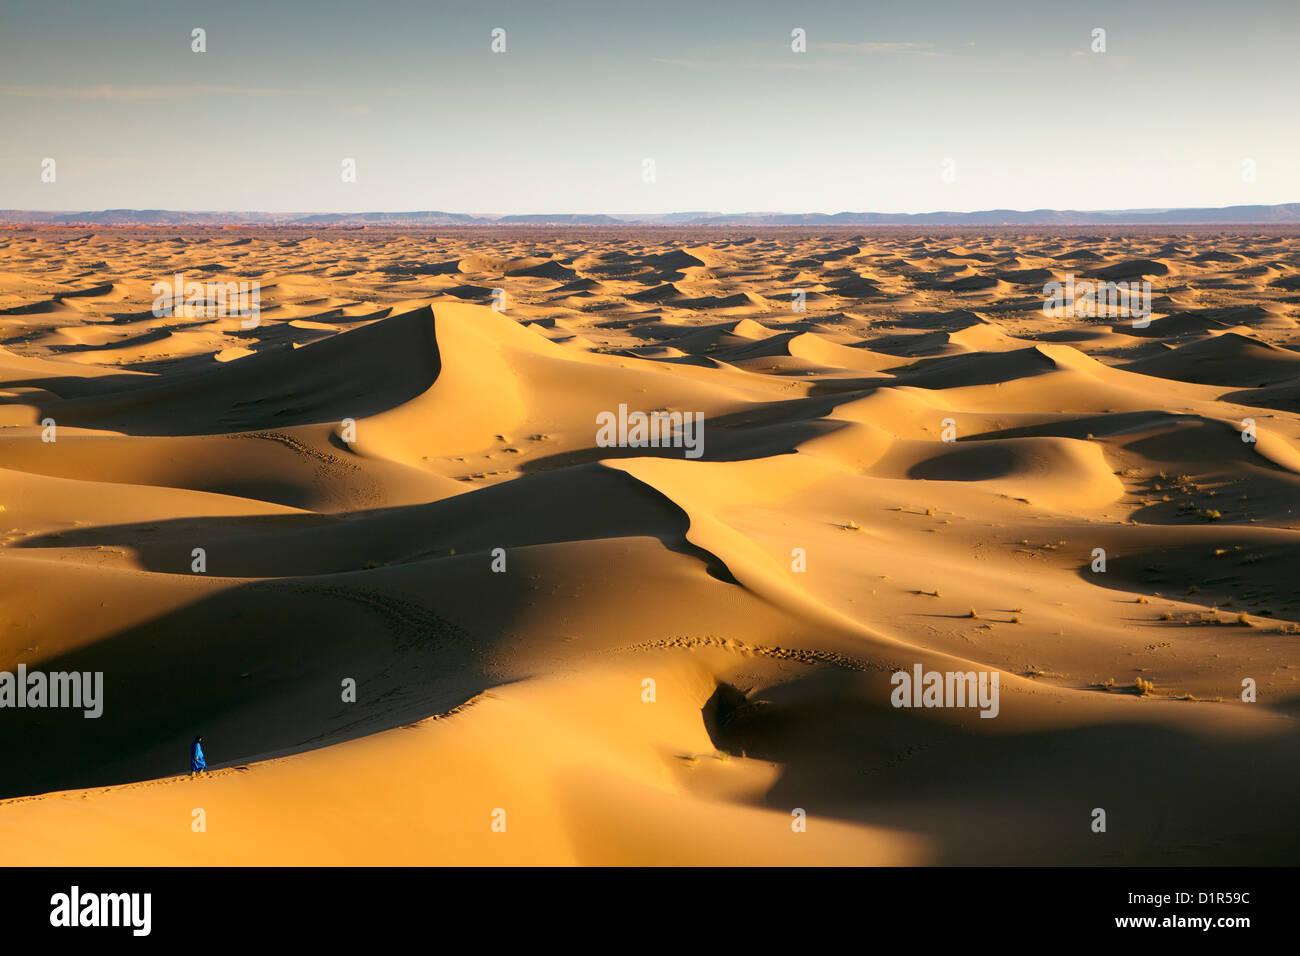 Marruecos, M'Hamid, Erg Chigaga dunas de arena. El desierto del Sahara. Hombre bereber local sobre una duna Imagen De Stock